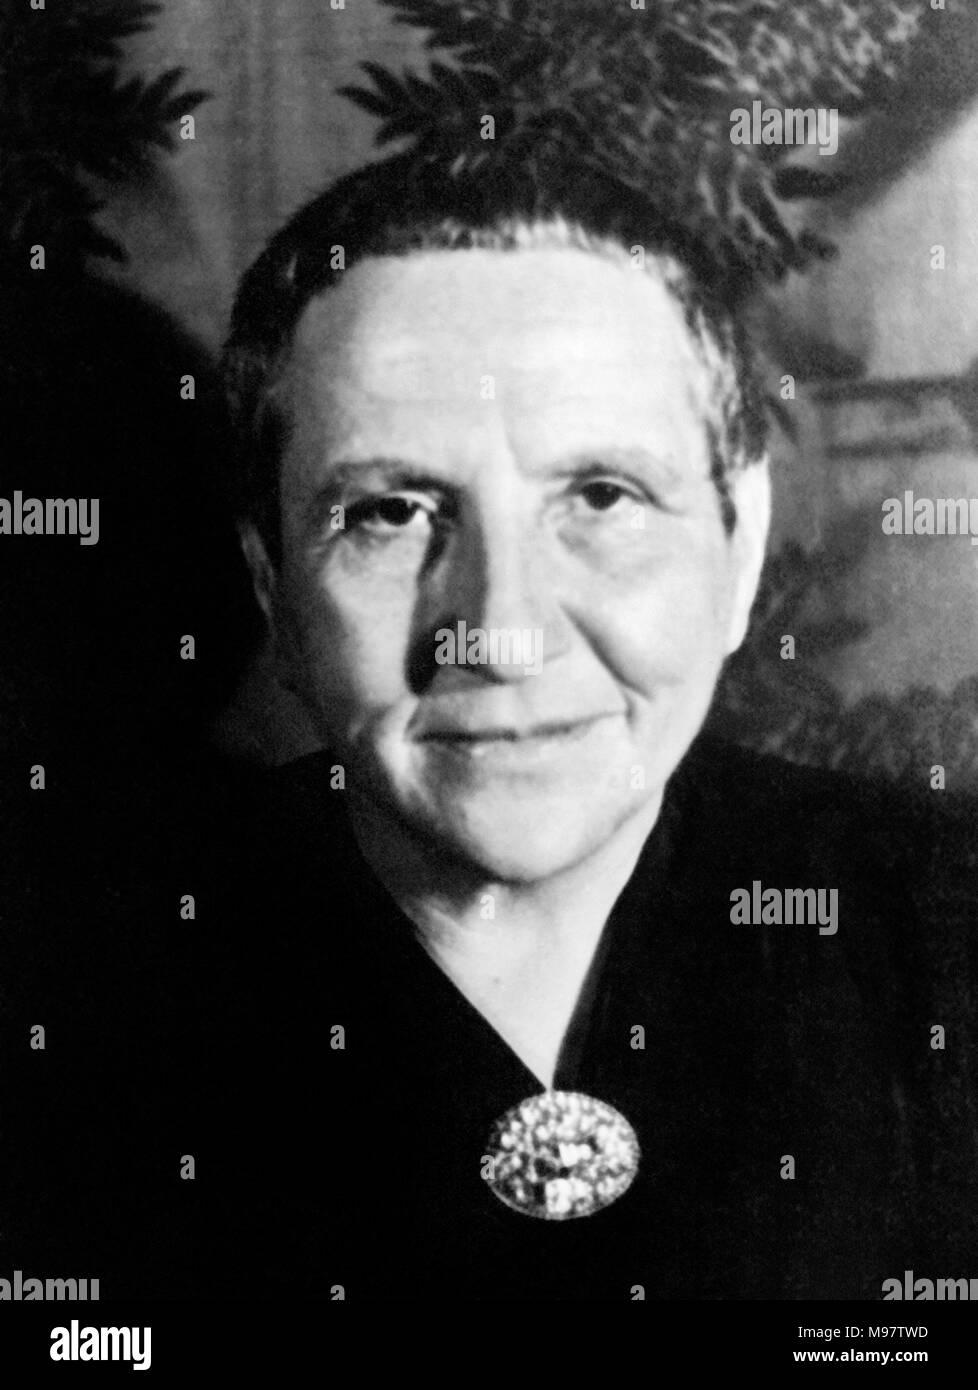 Gertrude Stein (1874-1946). Portrait of the American novelist and playwright by Carl Van Vechten, c.1934. - Stock Image